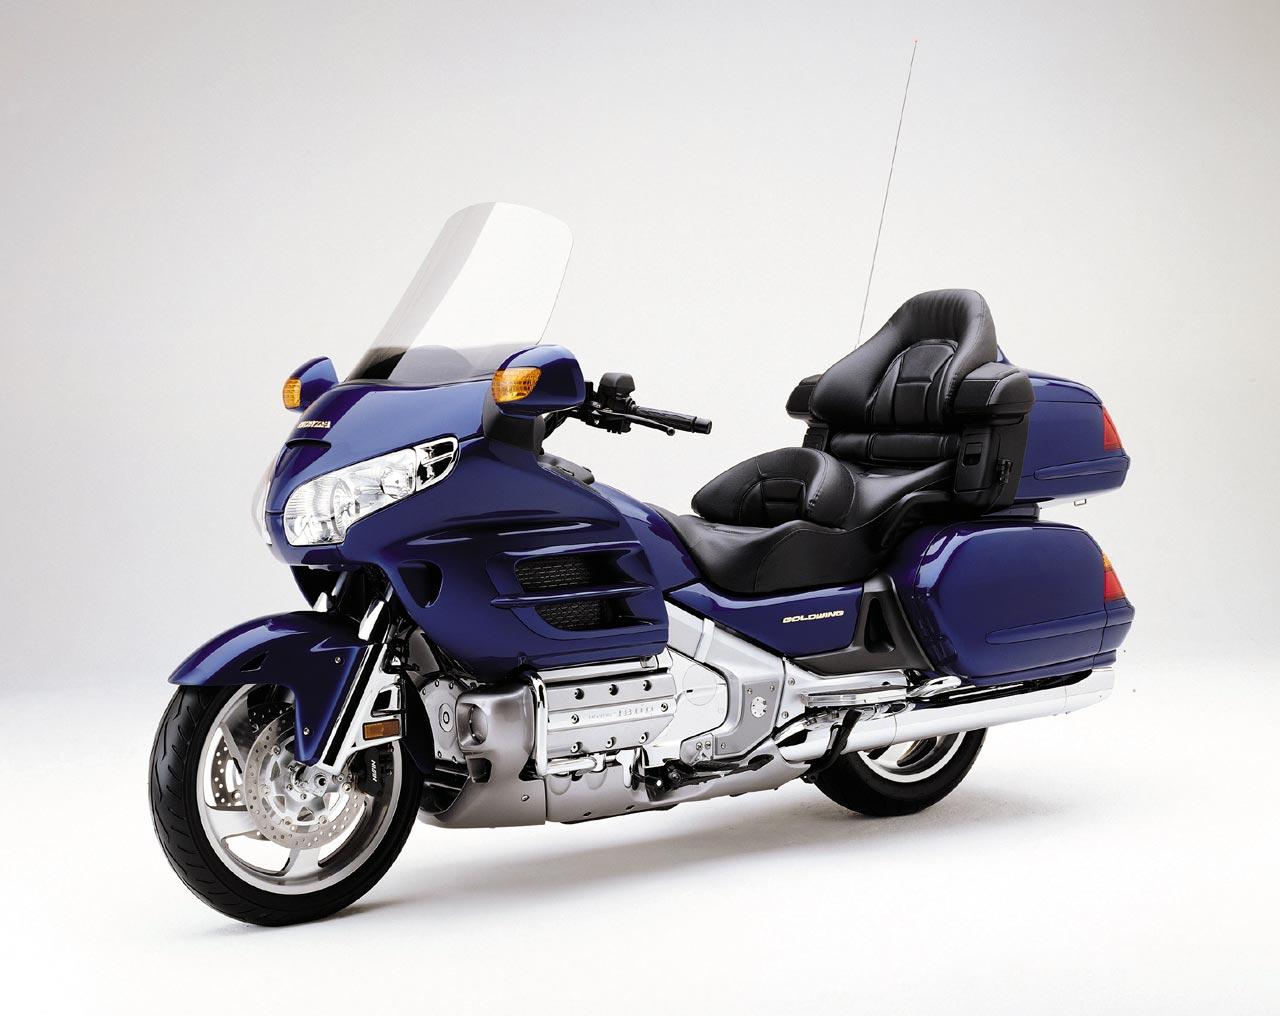 HONDA GL 1800 Gold Wing specs - 2000, 2001 - autoevolution